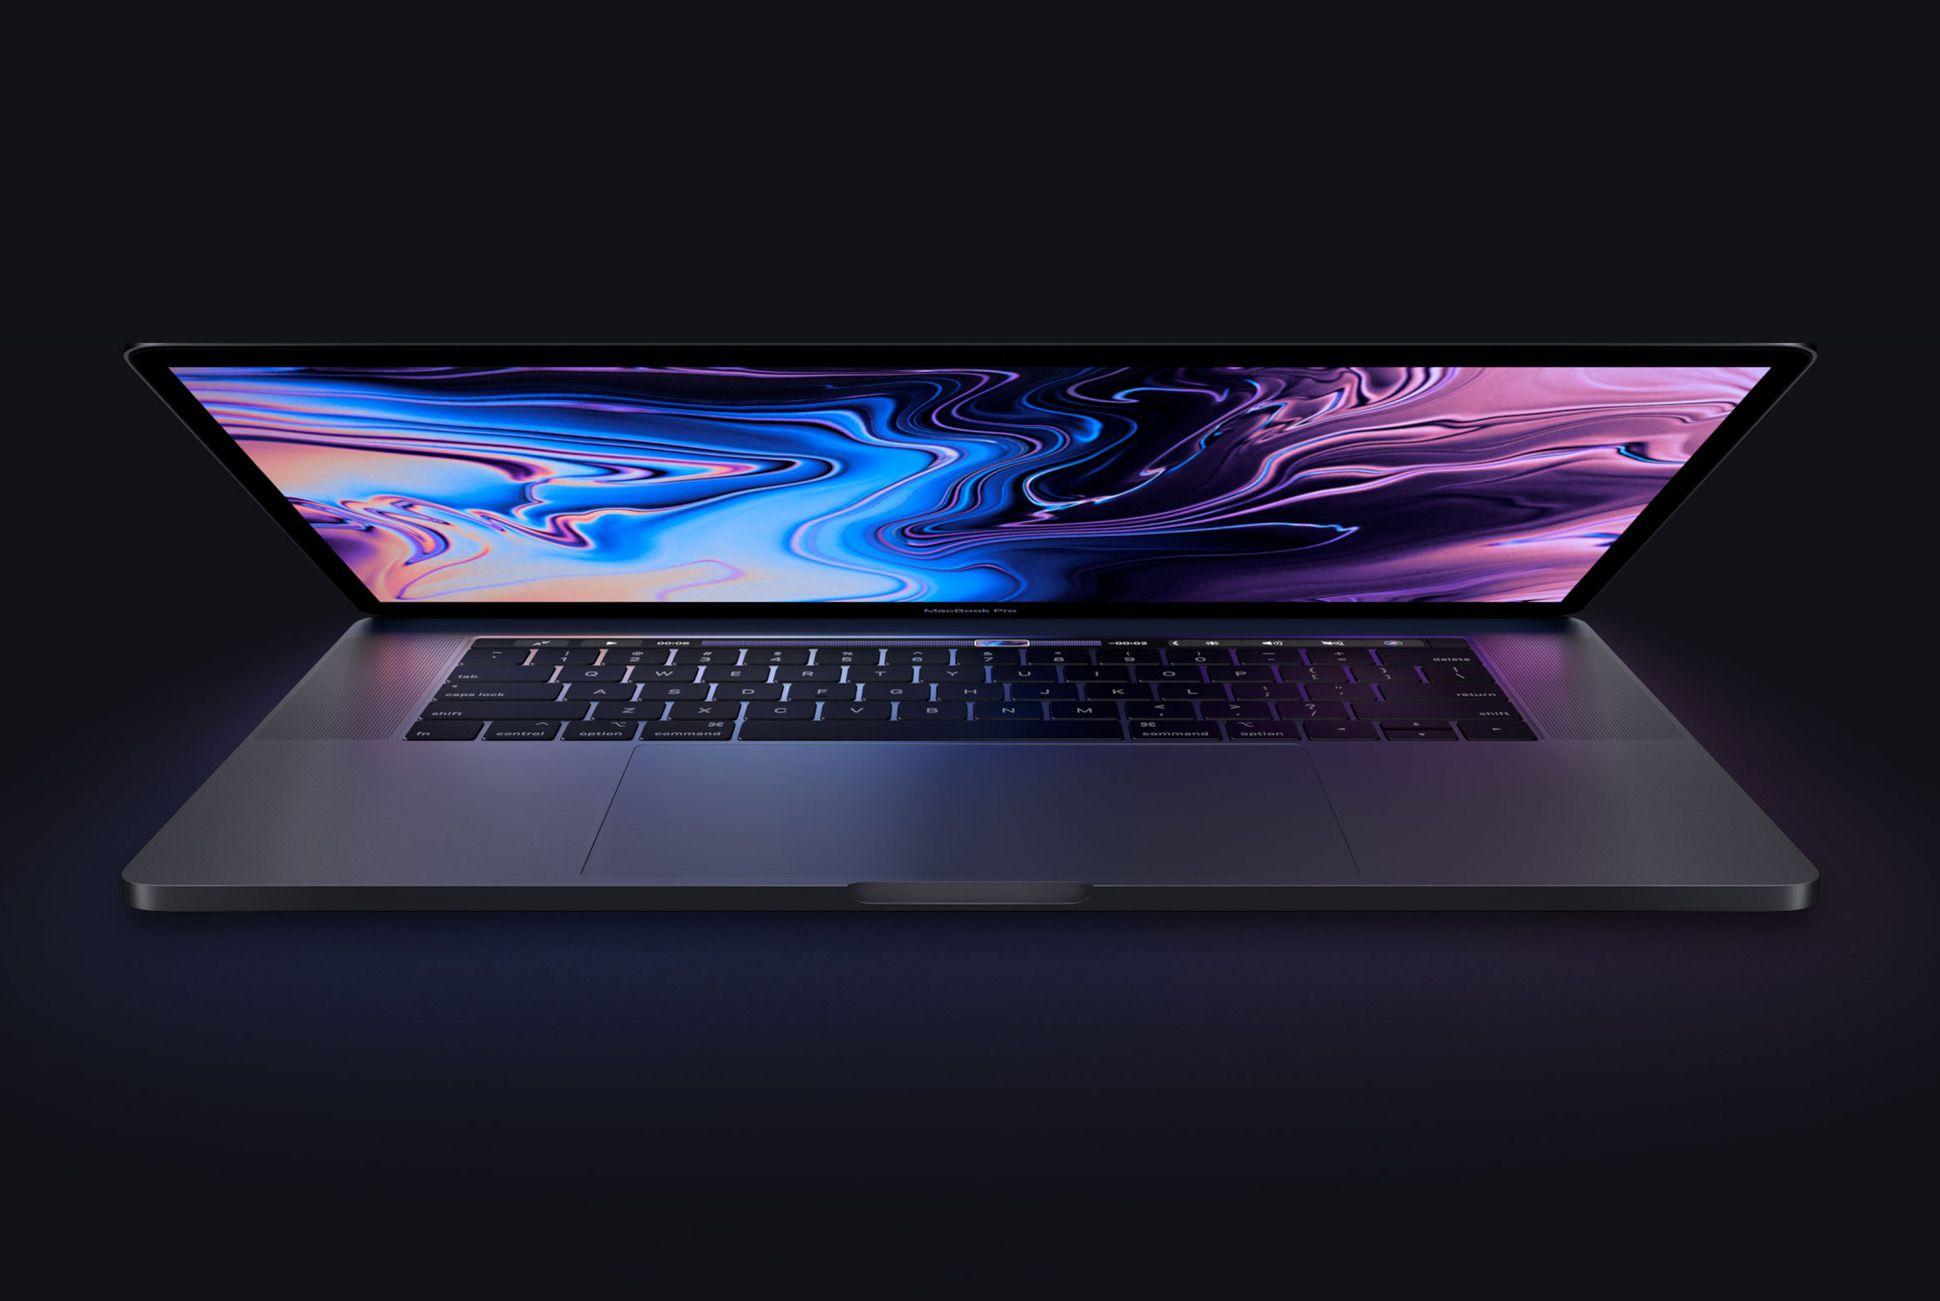 Apple Updates Its Macbook Pro Laptops For 2018 Gear Patrol Macbook Pro Apple Macbook Pro Macbook Pro Laptop